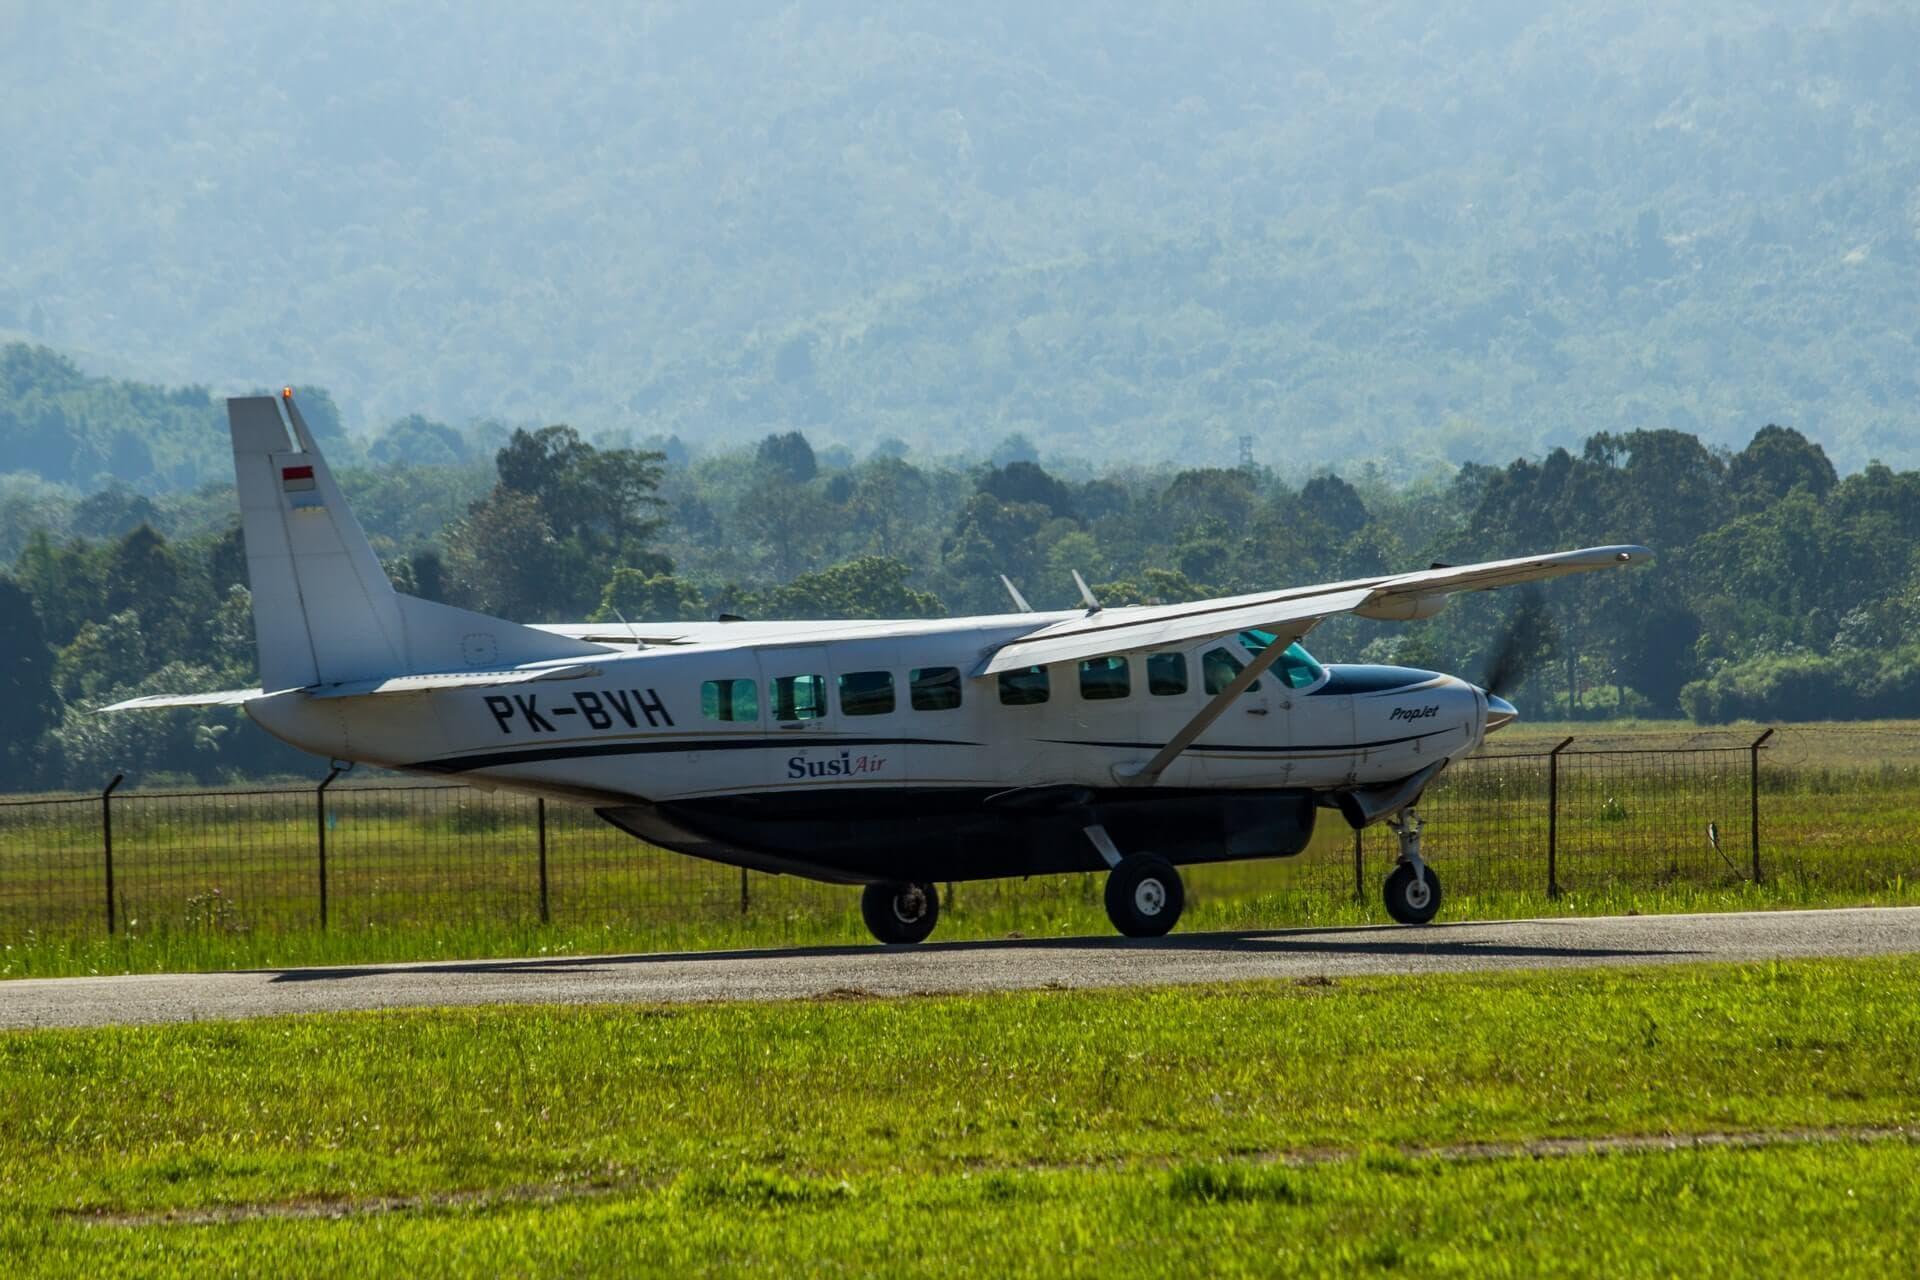 Susi Air plane takeoff, Depati Parbo airport, Kerinci, Jambi, Sumatra, Indonesia travel to kerinci